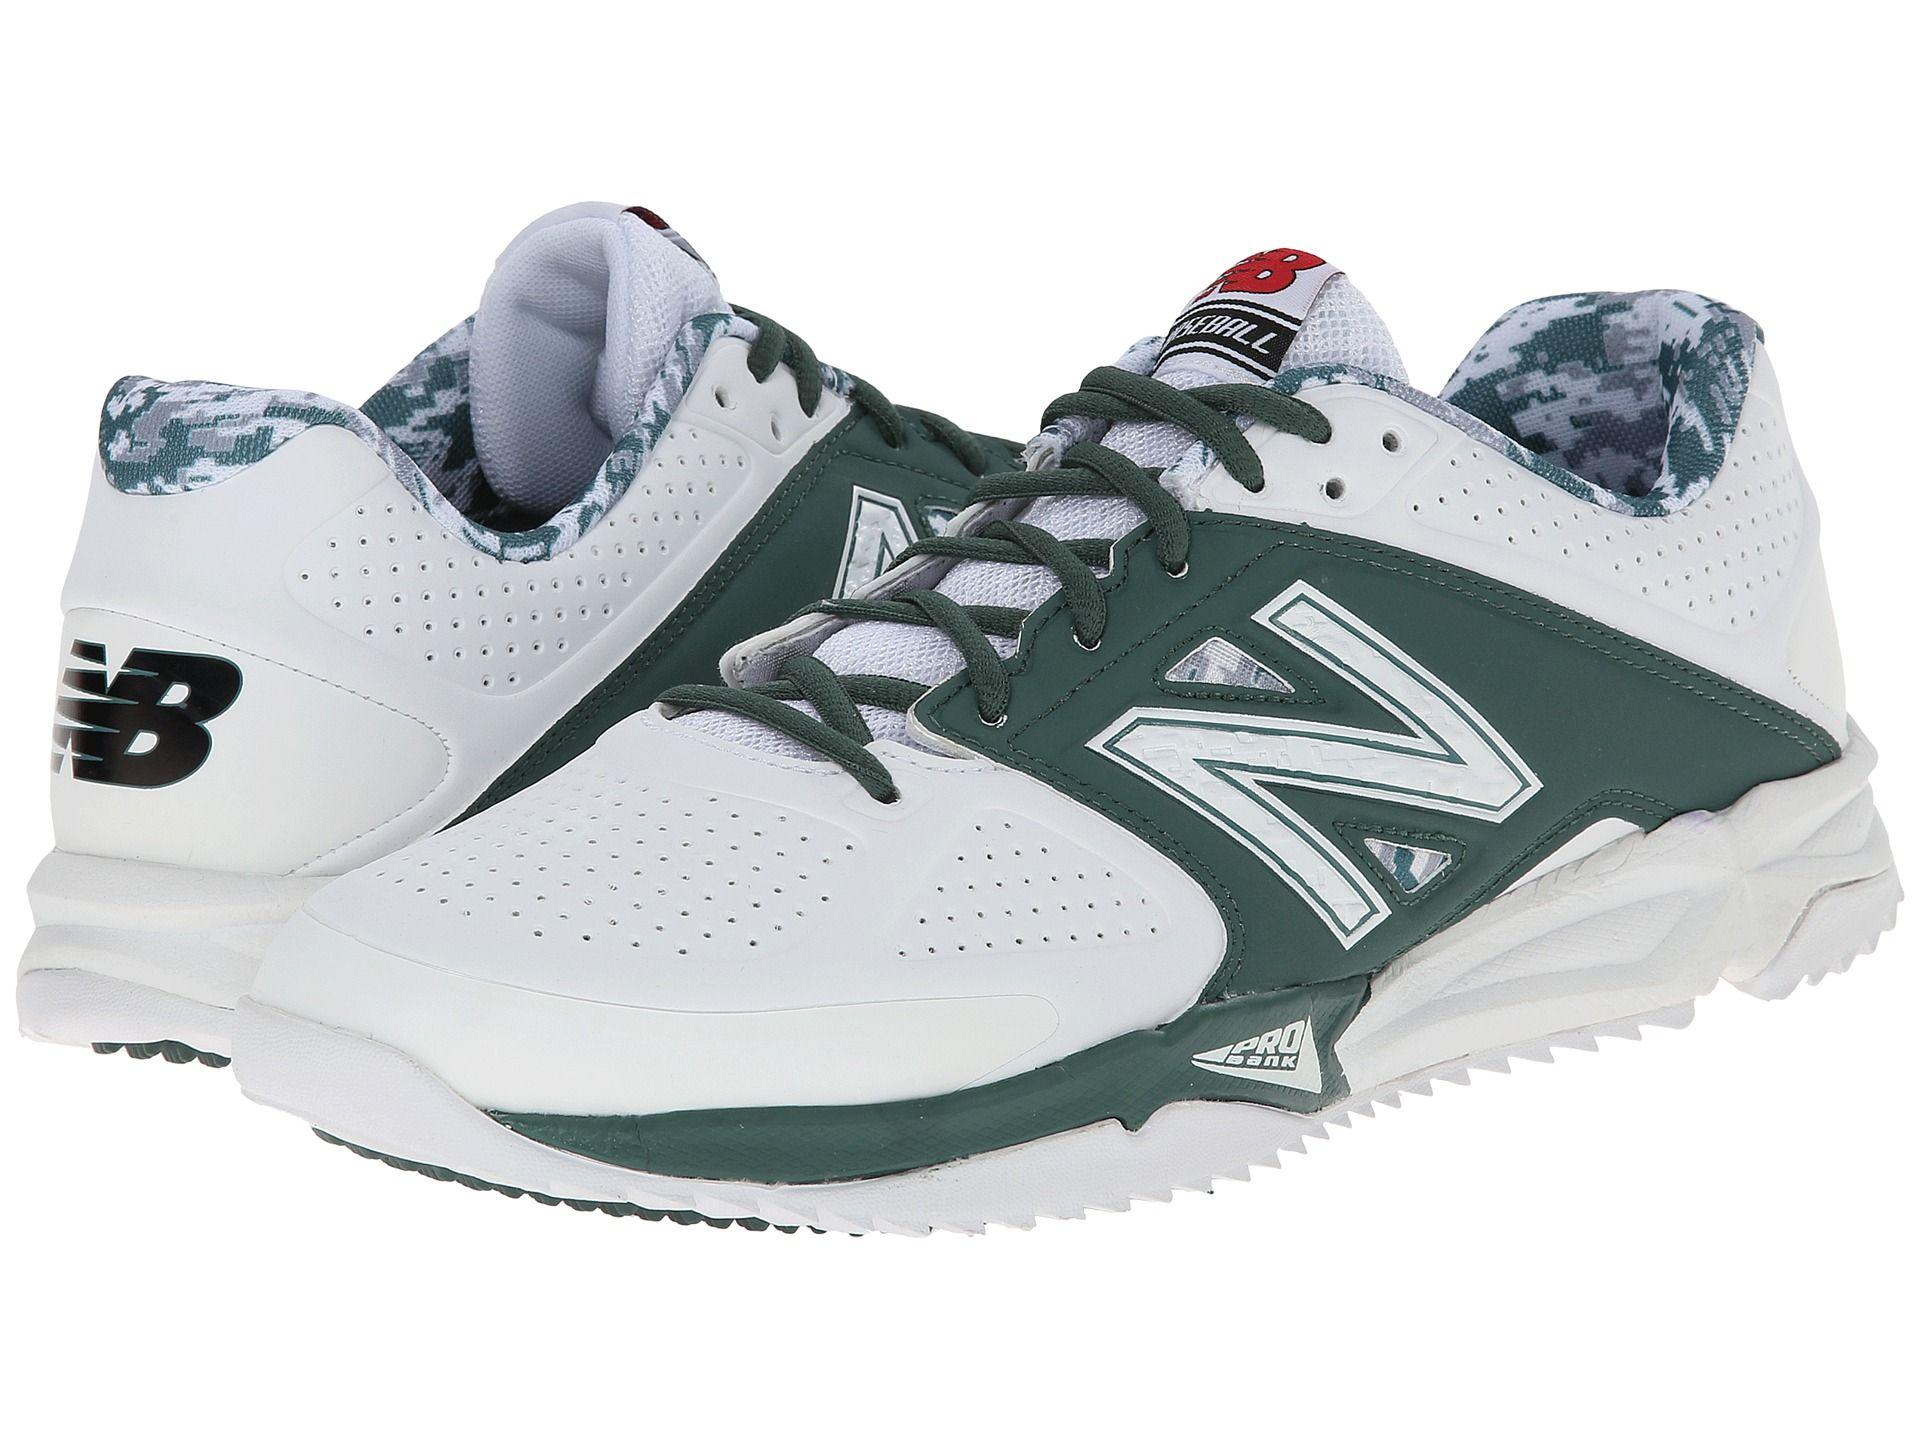 New Balance Turfs | new balance 4040v2 turf synthetic | Softball ...